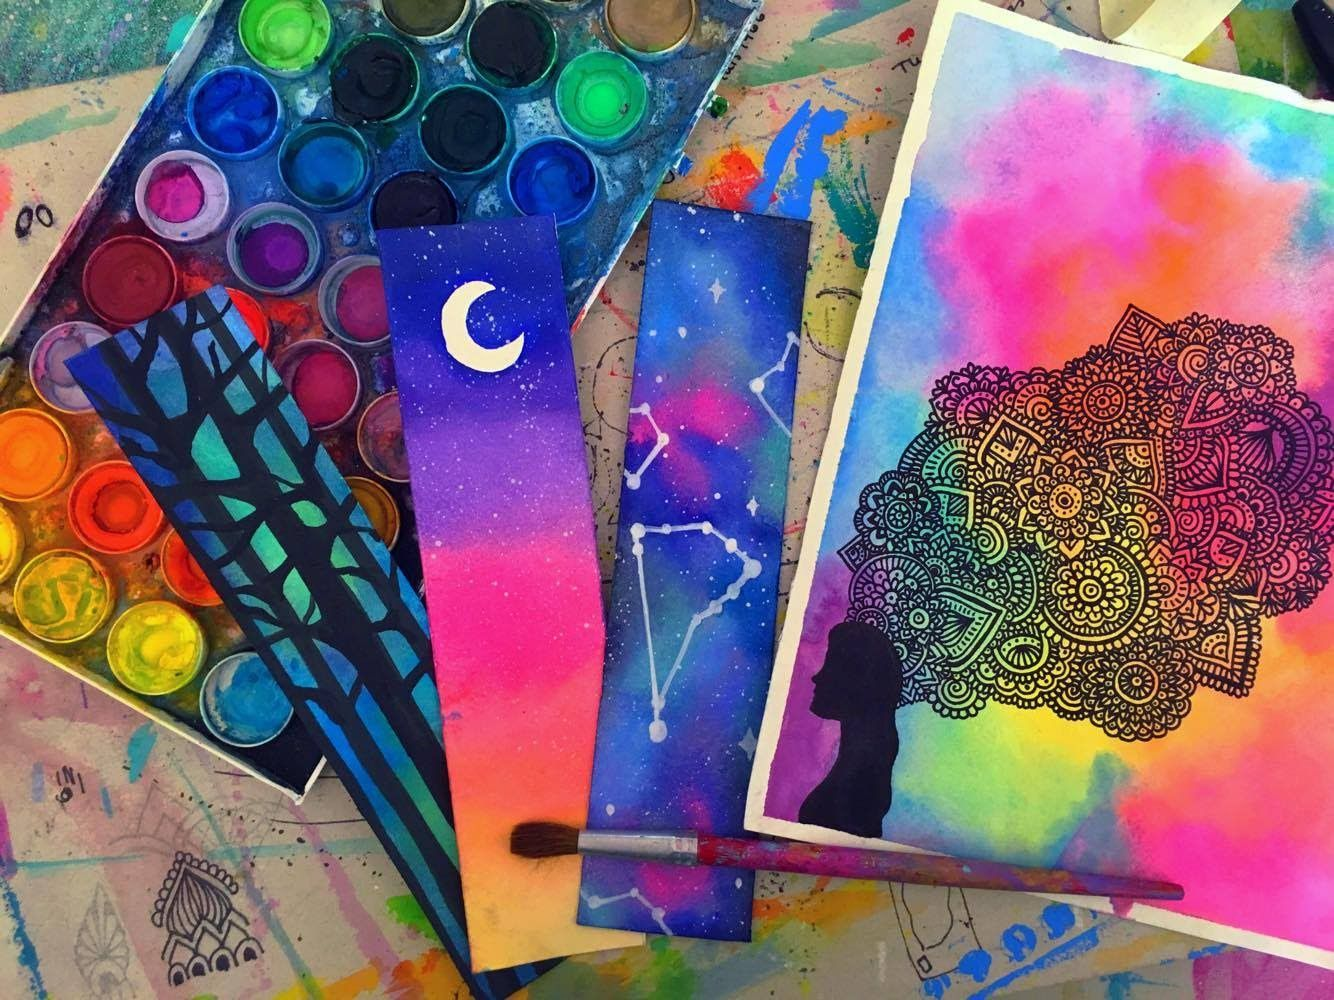 Mi Secreto Para Pintar Con Acuarelas Dani Hoyos Art Pintar